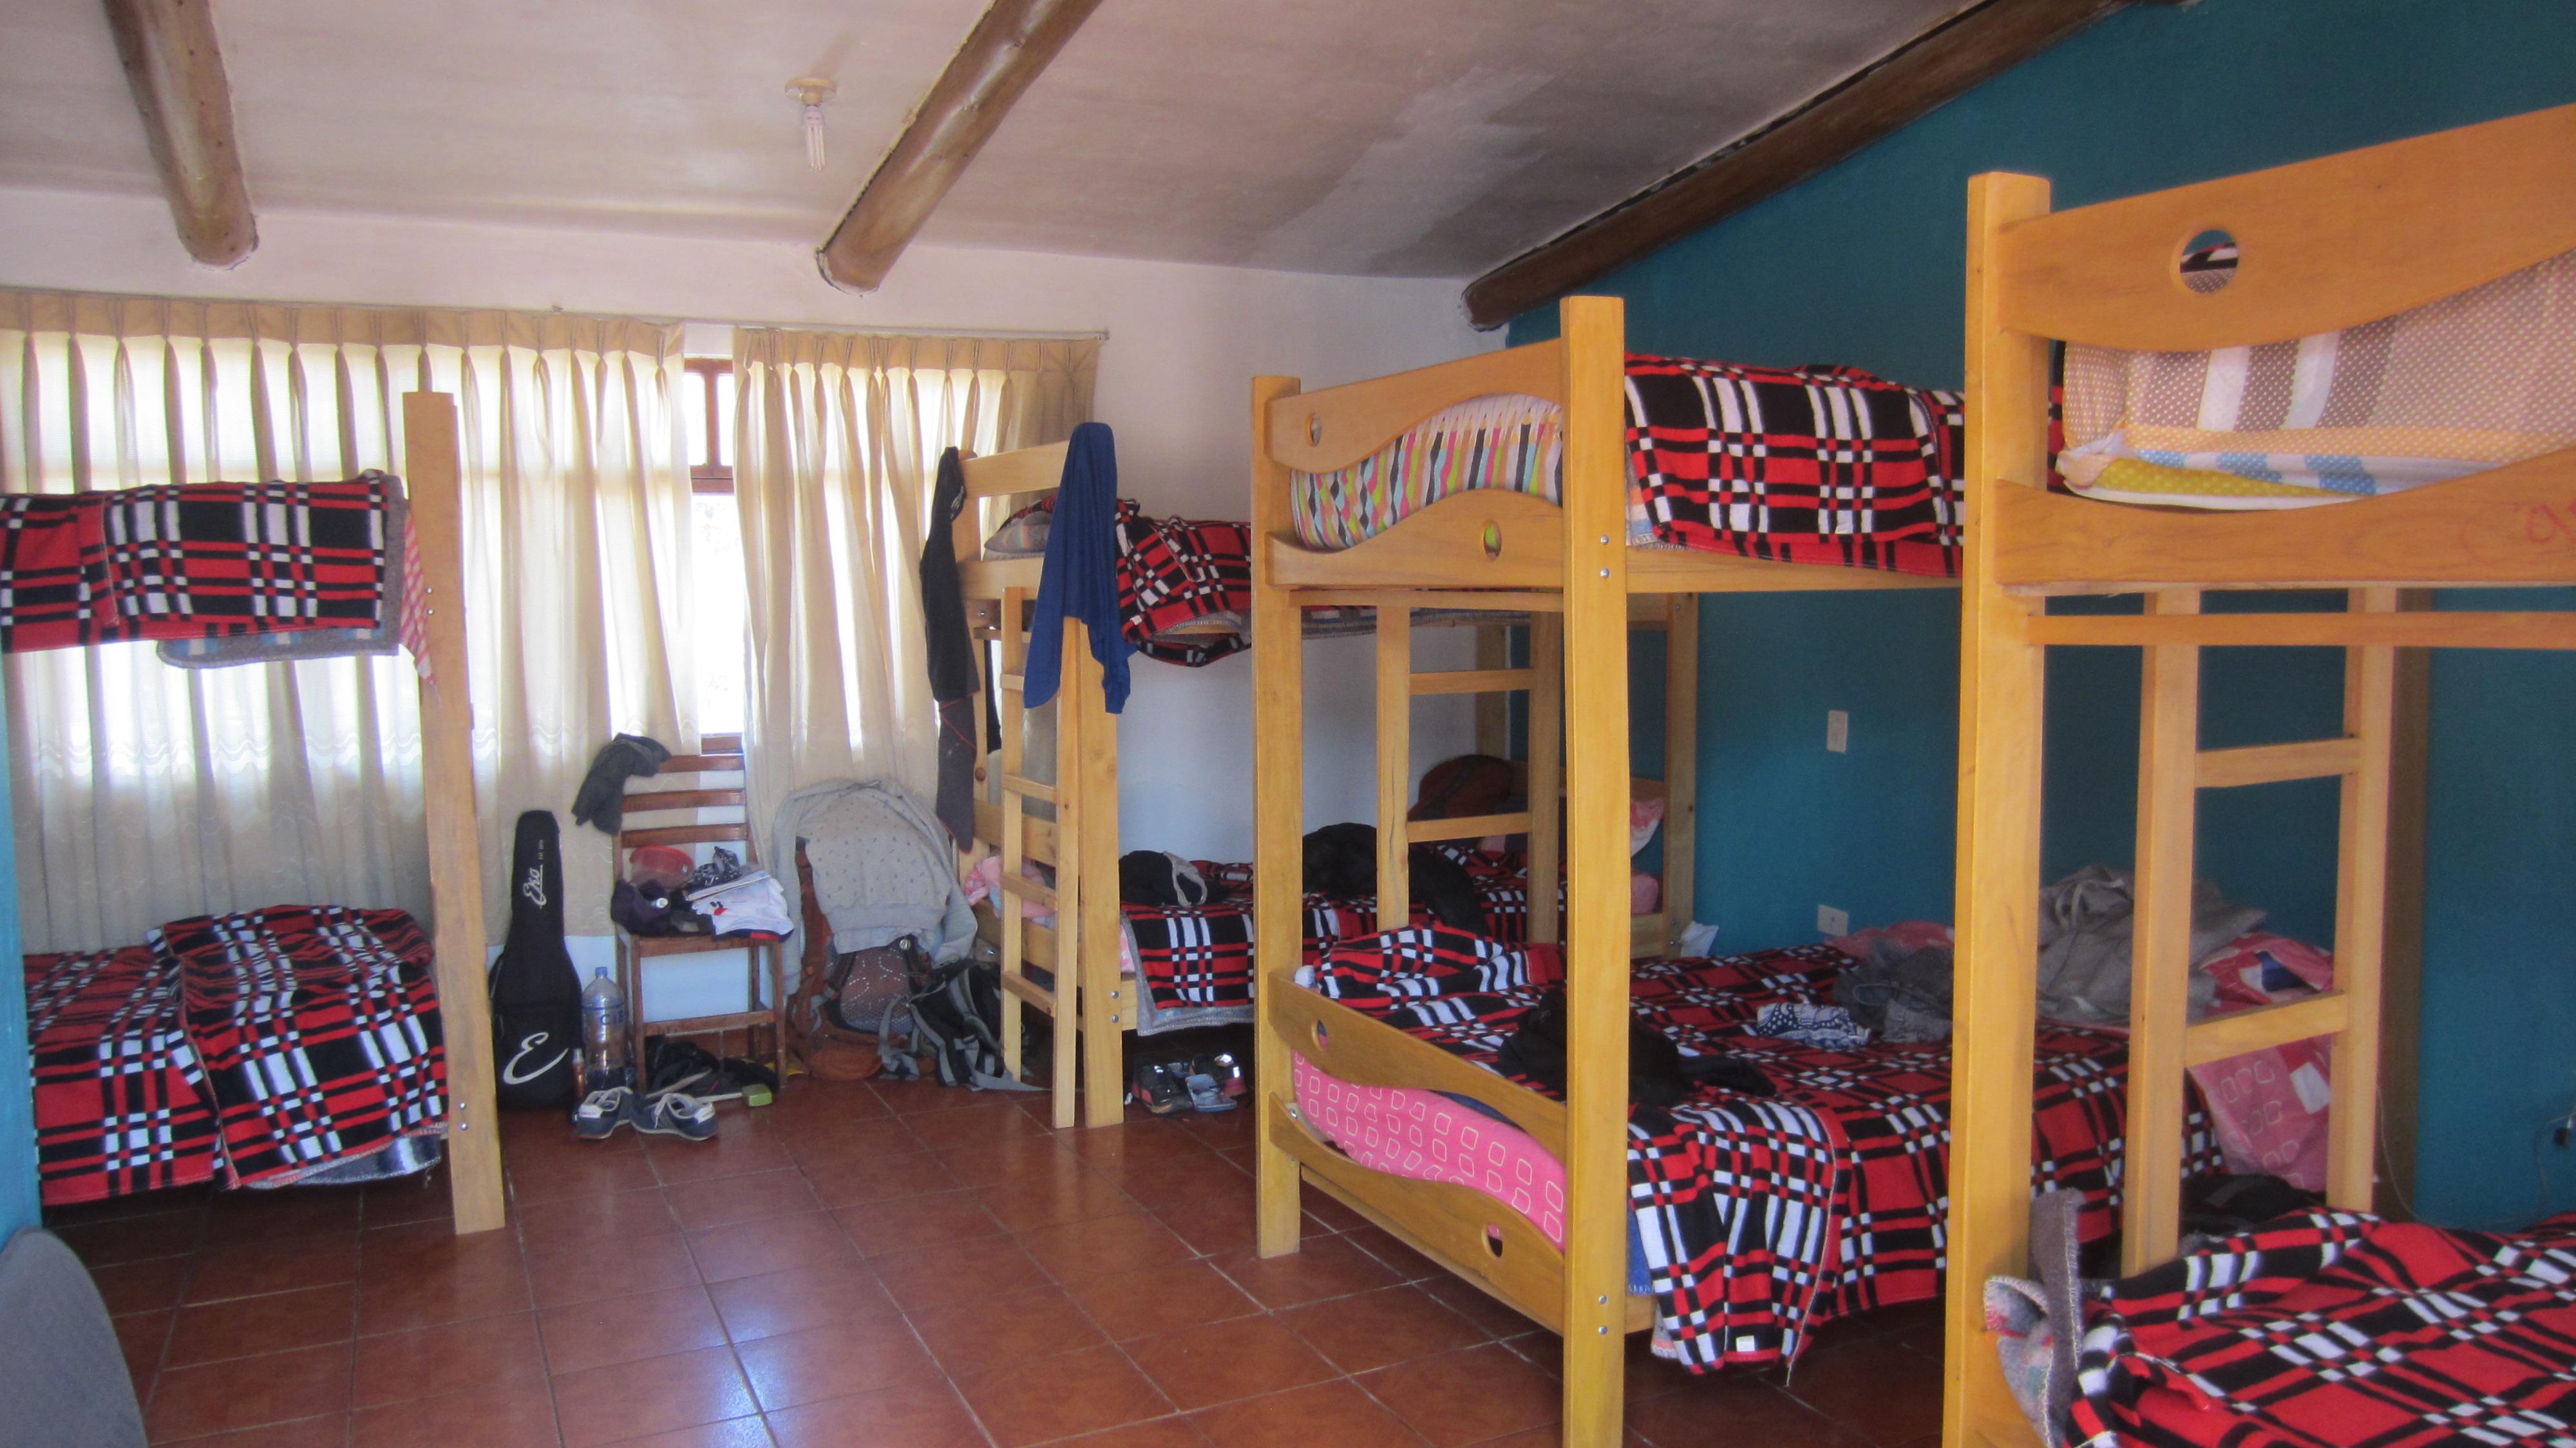 Vacahouse 2 Eco-Hostel